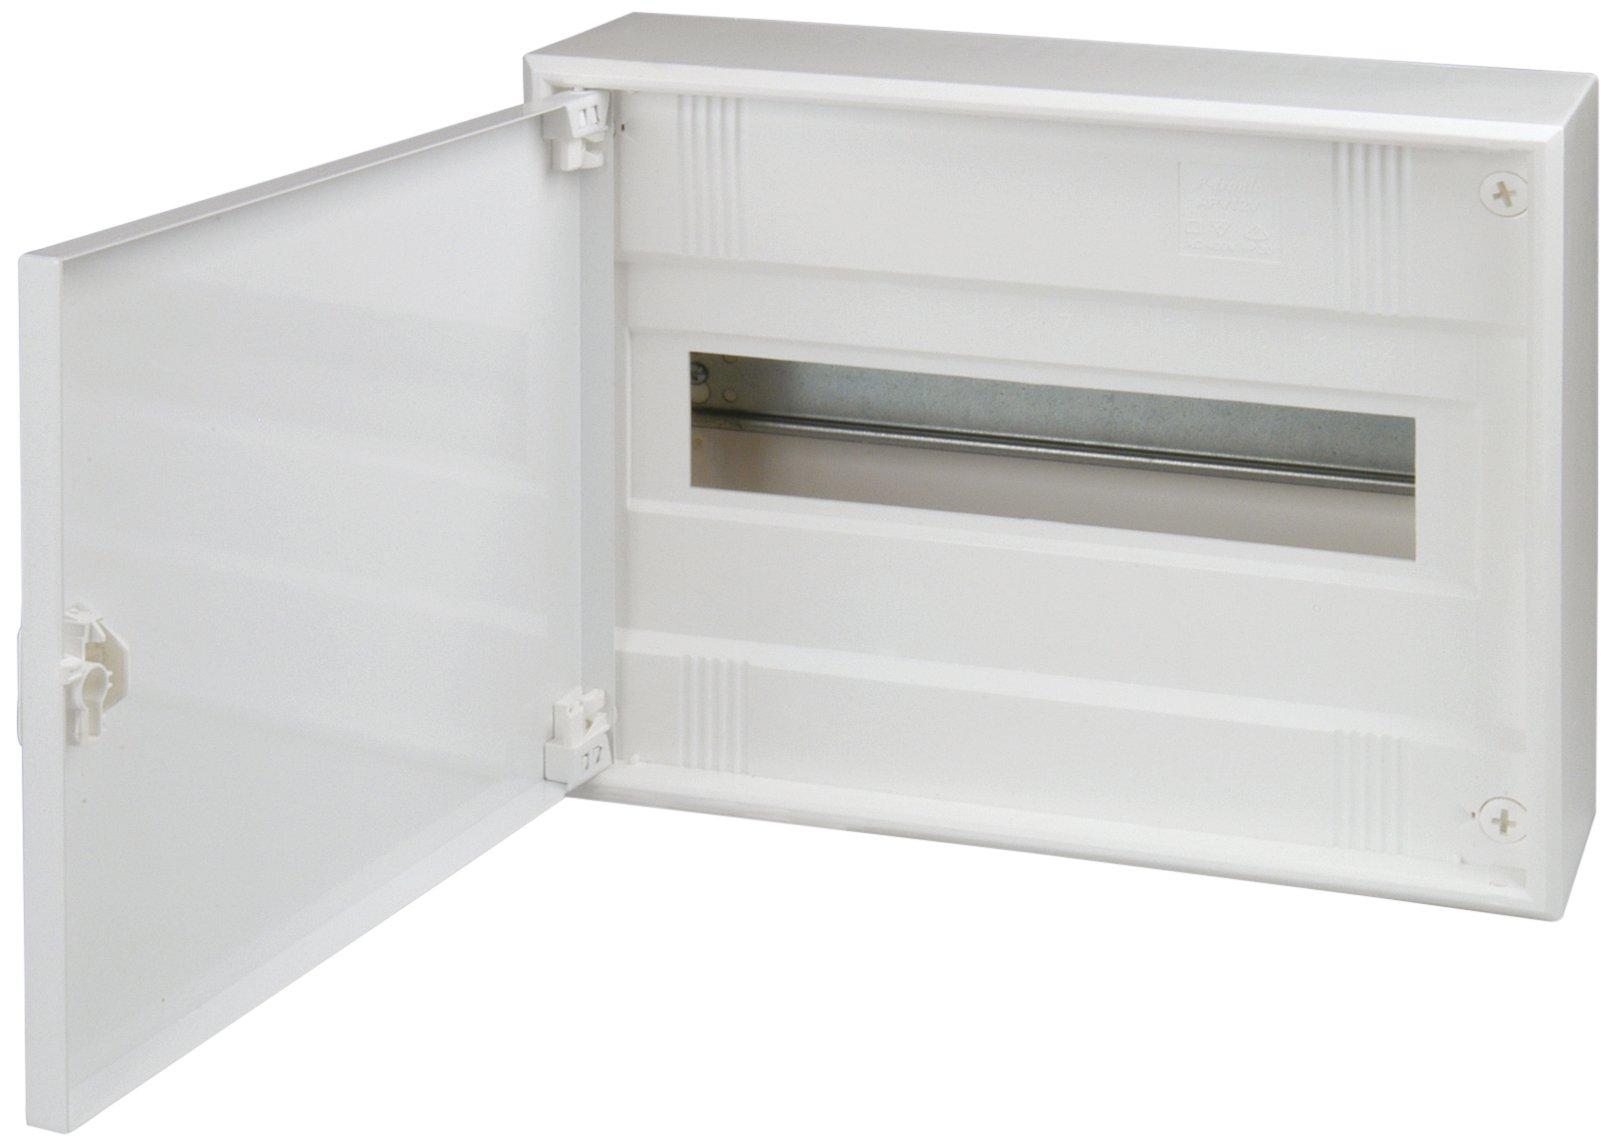 Unitec 47594Surface-Mounted Junction Box, 1Row with Steel Door